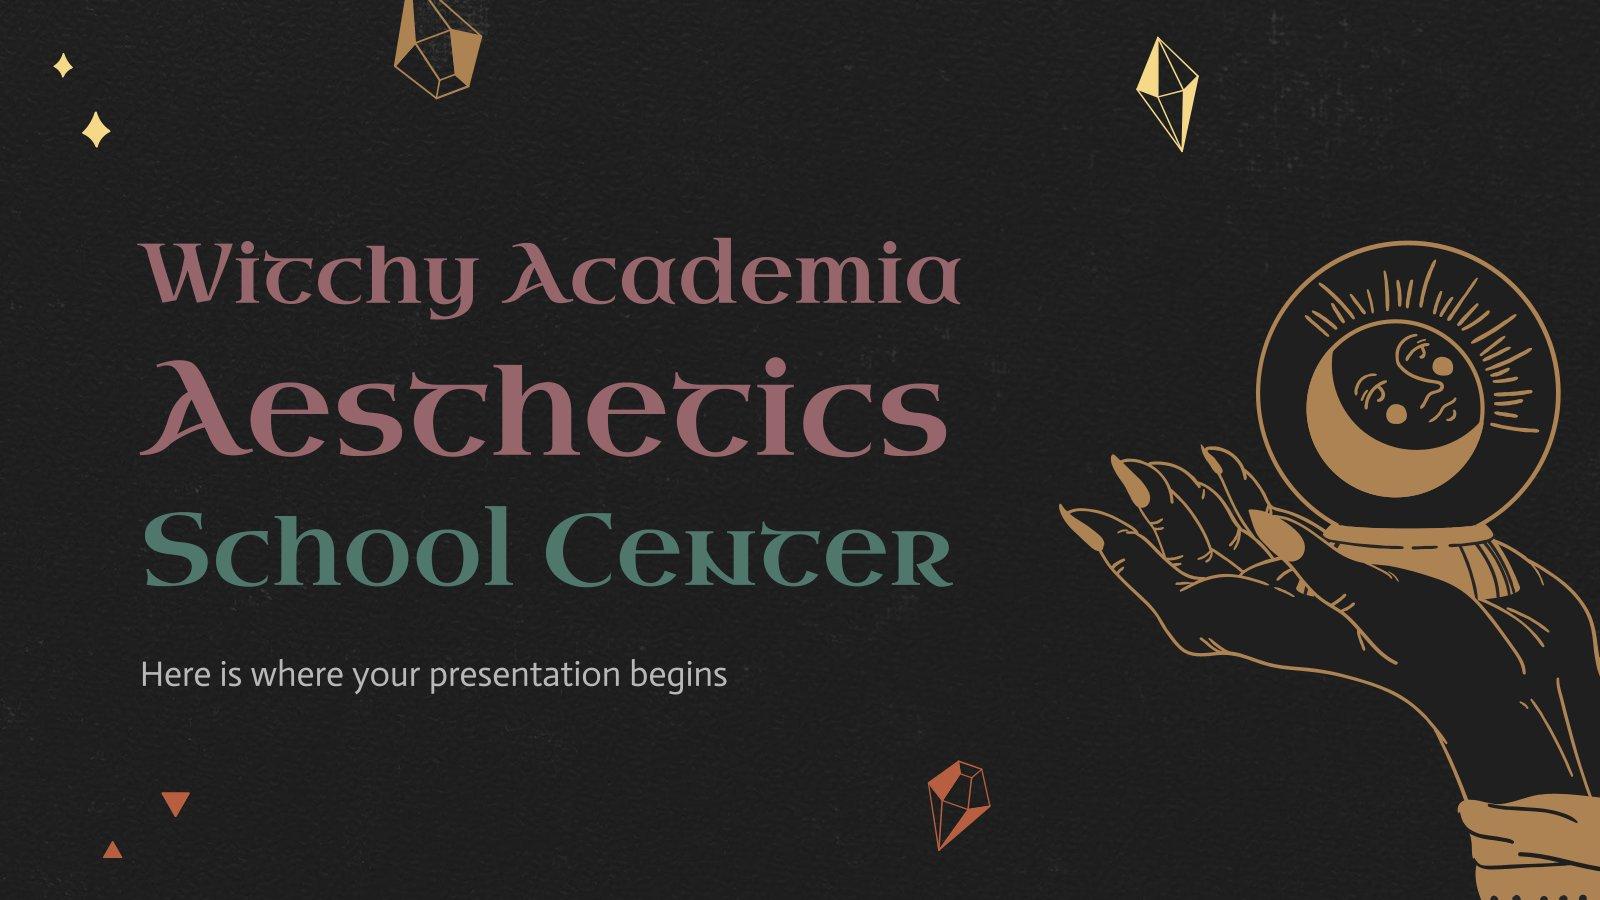 Witchy Academia Aesthetics School Center presentation template